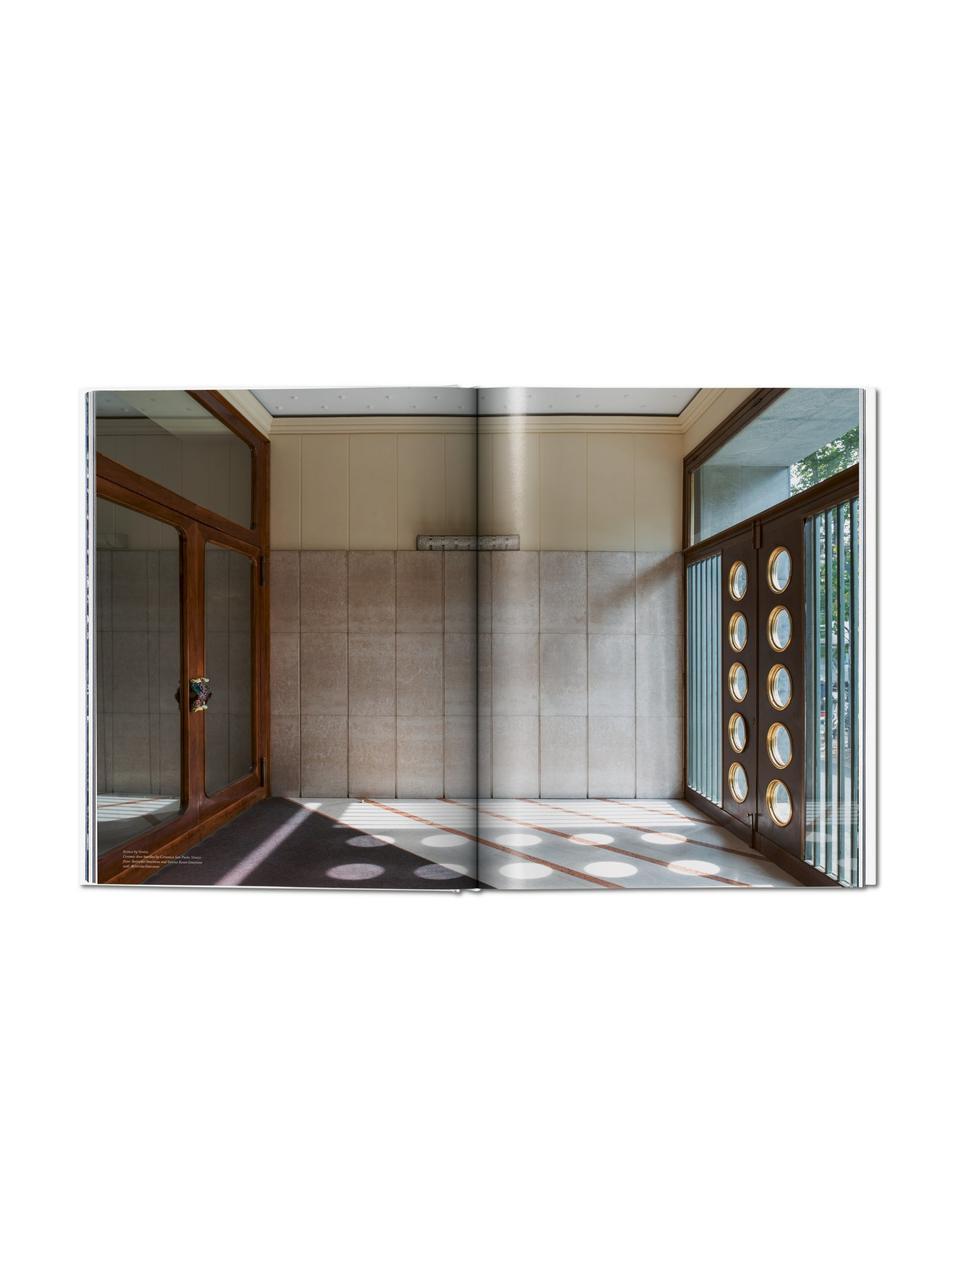 Bildband Entryways of Milan, Papier, Hardcover, Weiß, Mehrfarbig, 26 x 34 cm